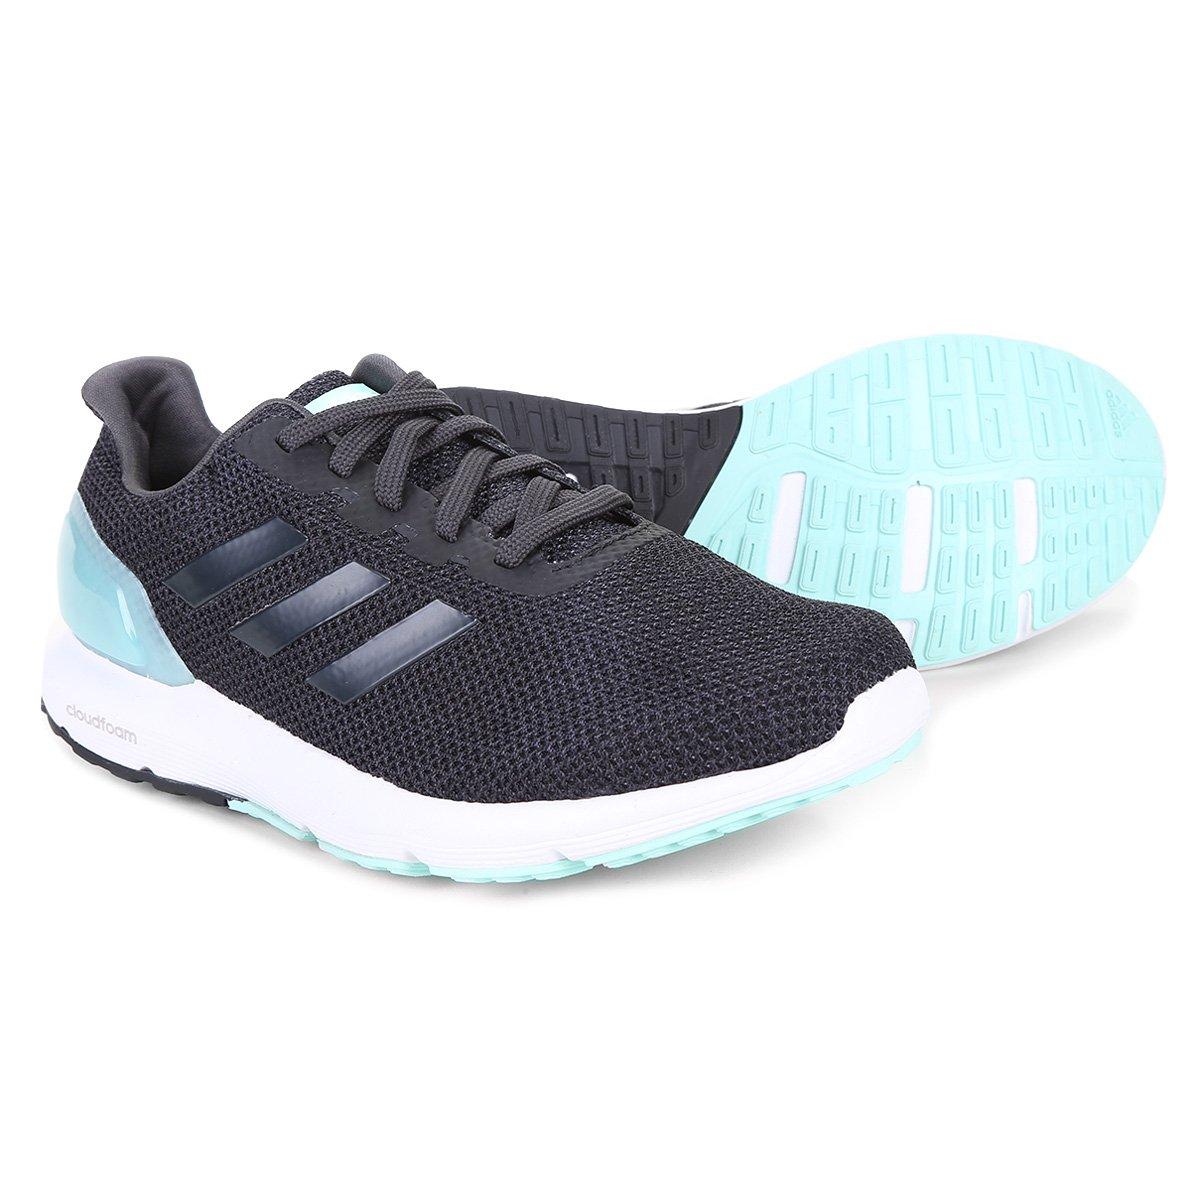 52db516c09f Tênis Adidas Cosmic 2 SL Feminino - Cinza - Compre Agora